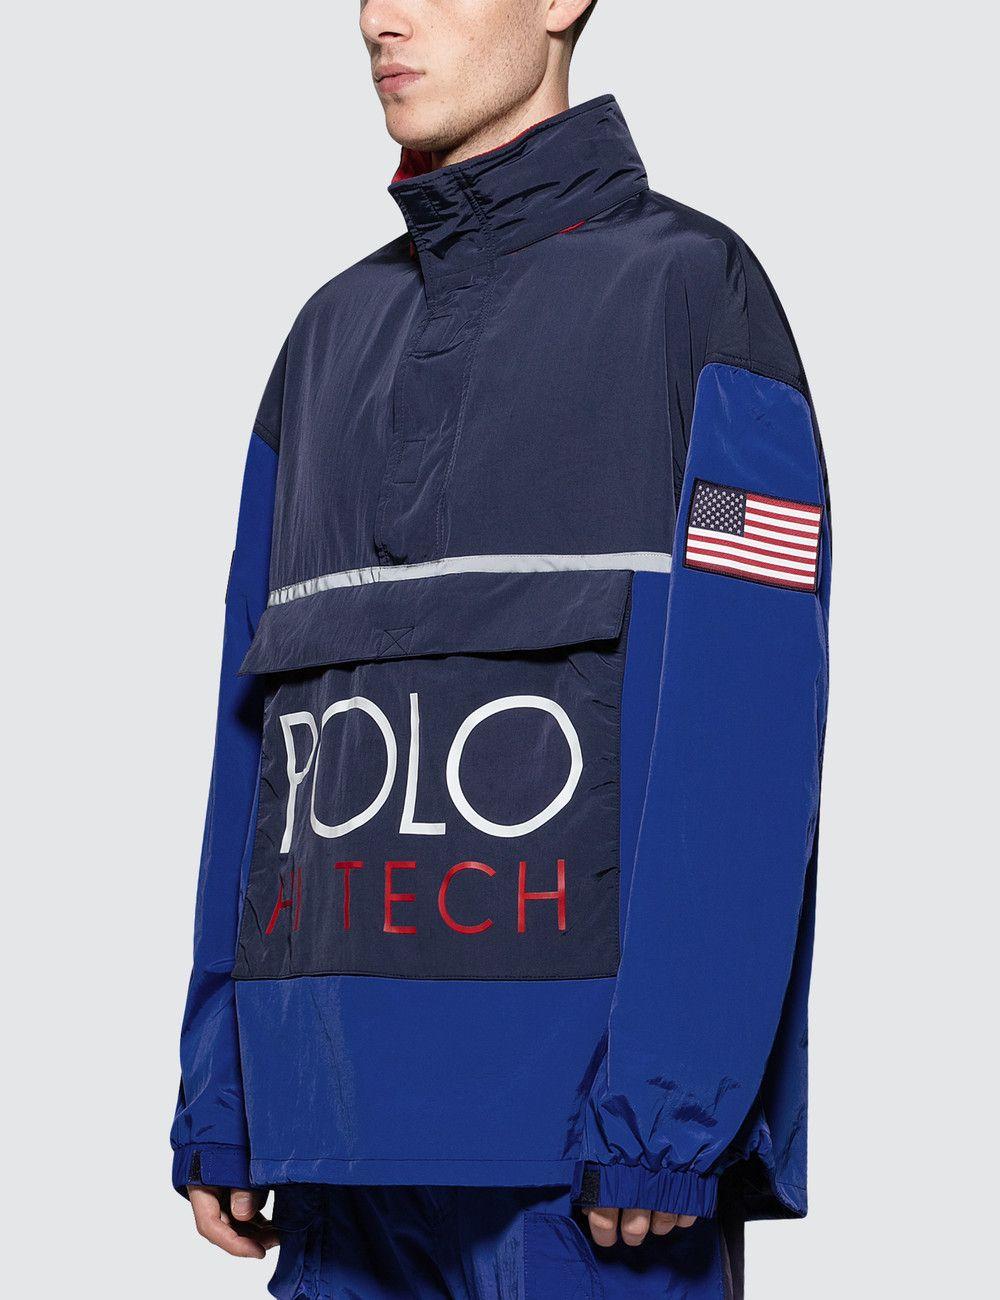 Hi tech jacket polo design polo ralph lauren jackets